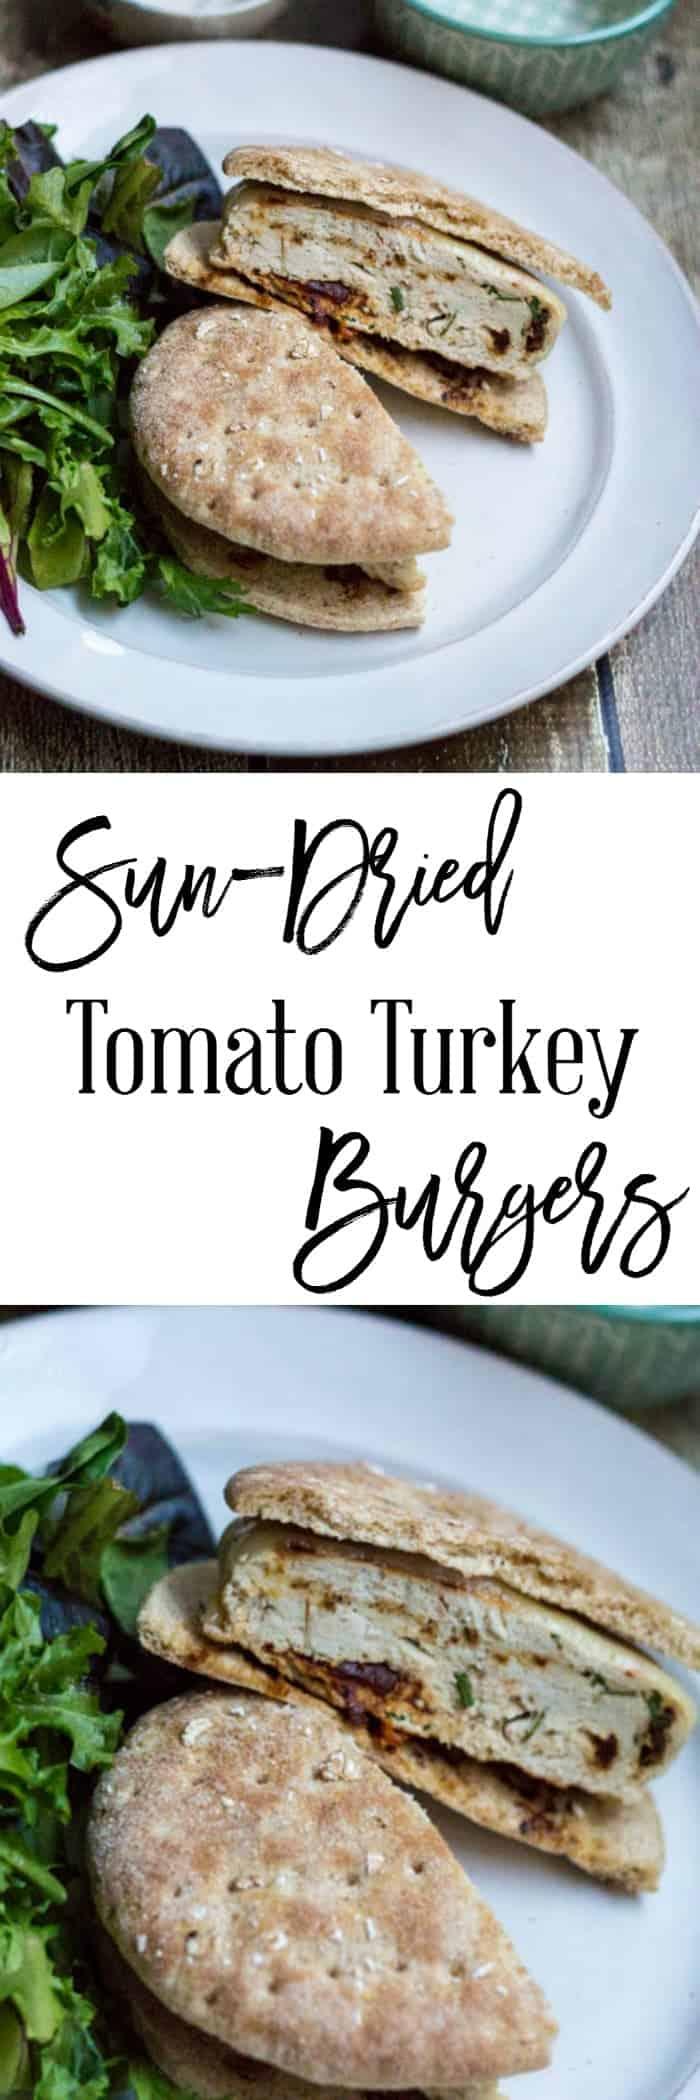 Sun-Dried Tomato Turkey Burgers